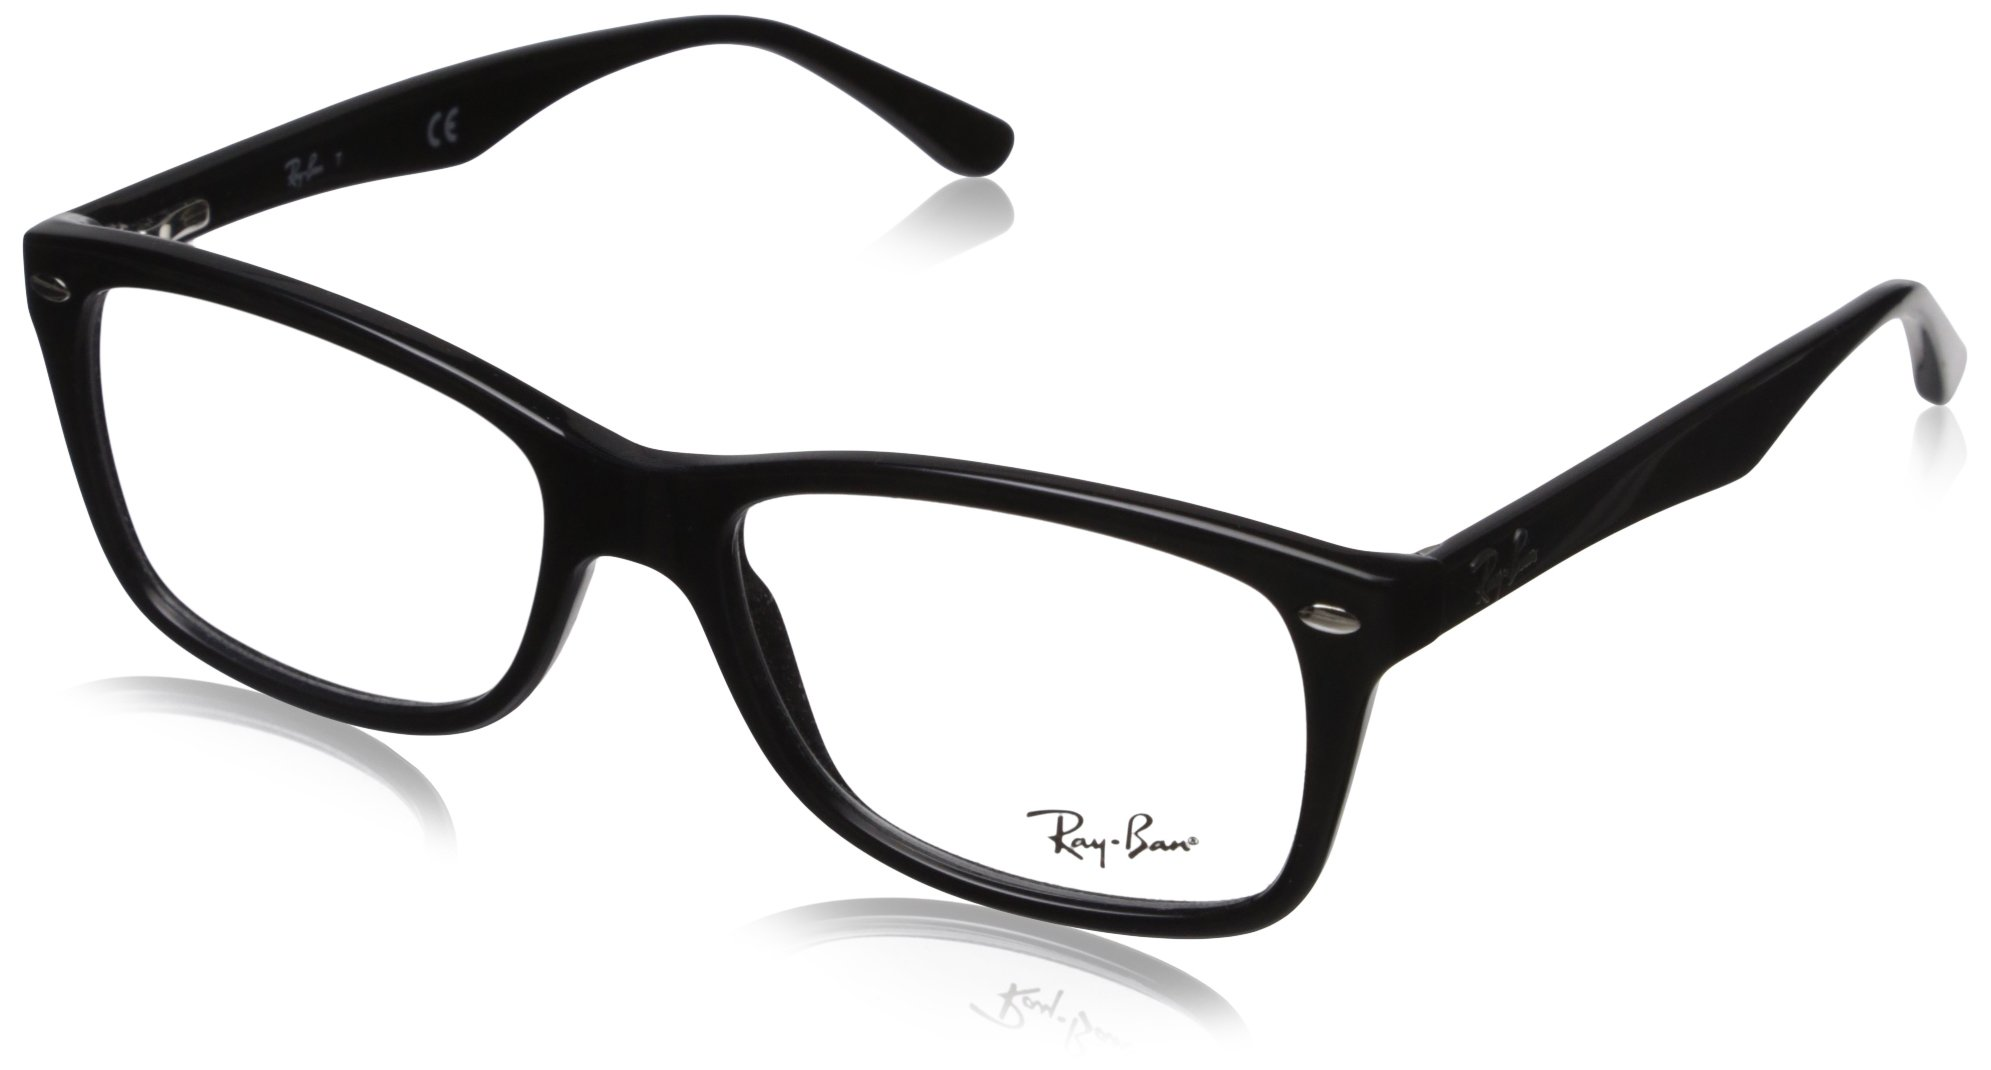 Ray-Ban Women's RX5228 Eyeglasses Shiny Black 53mm